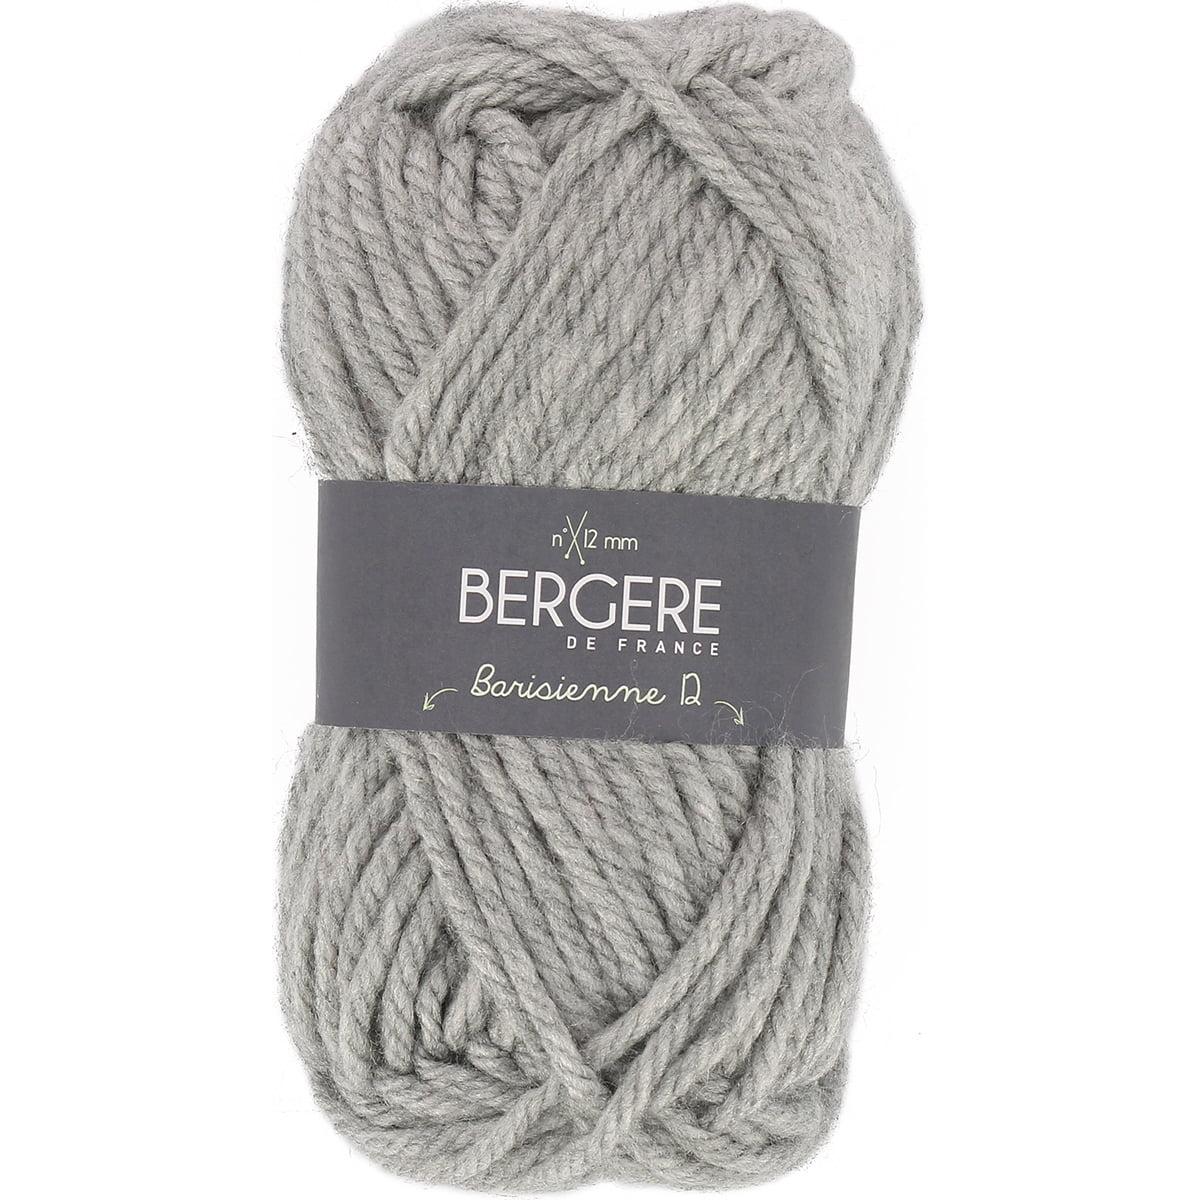 Bergere De France Barisienne 12 YarnArmure